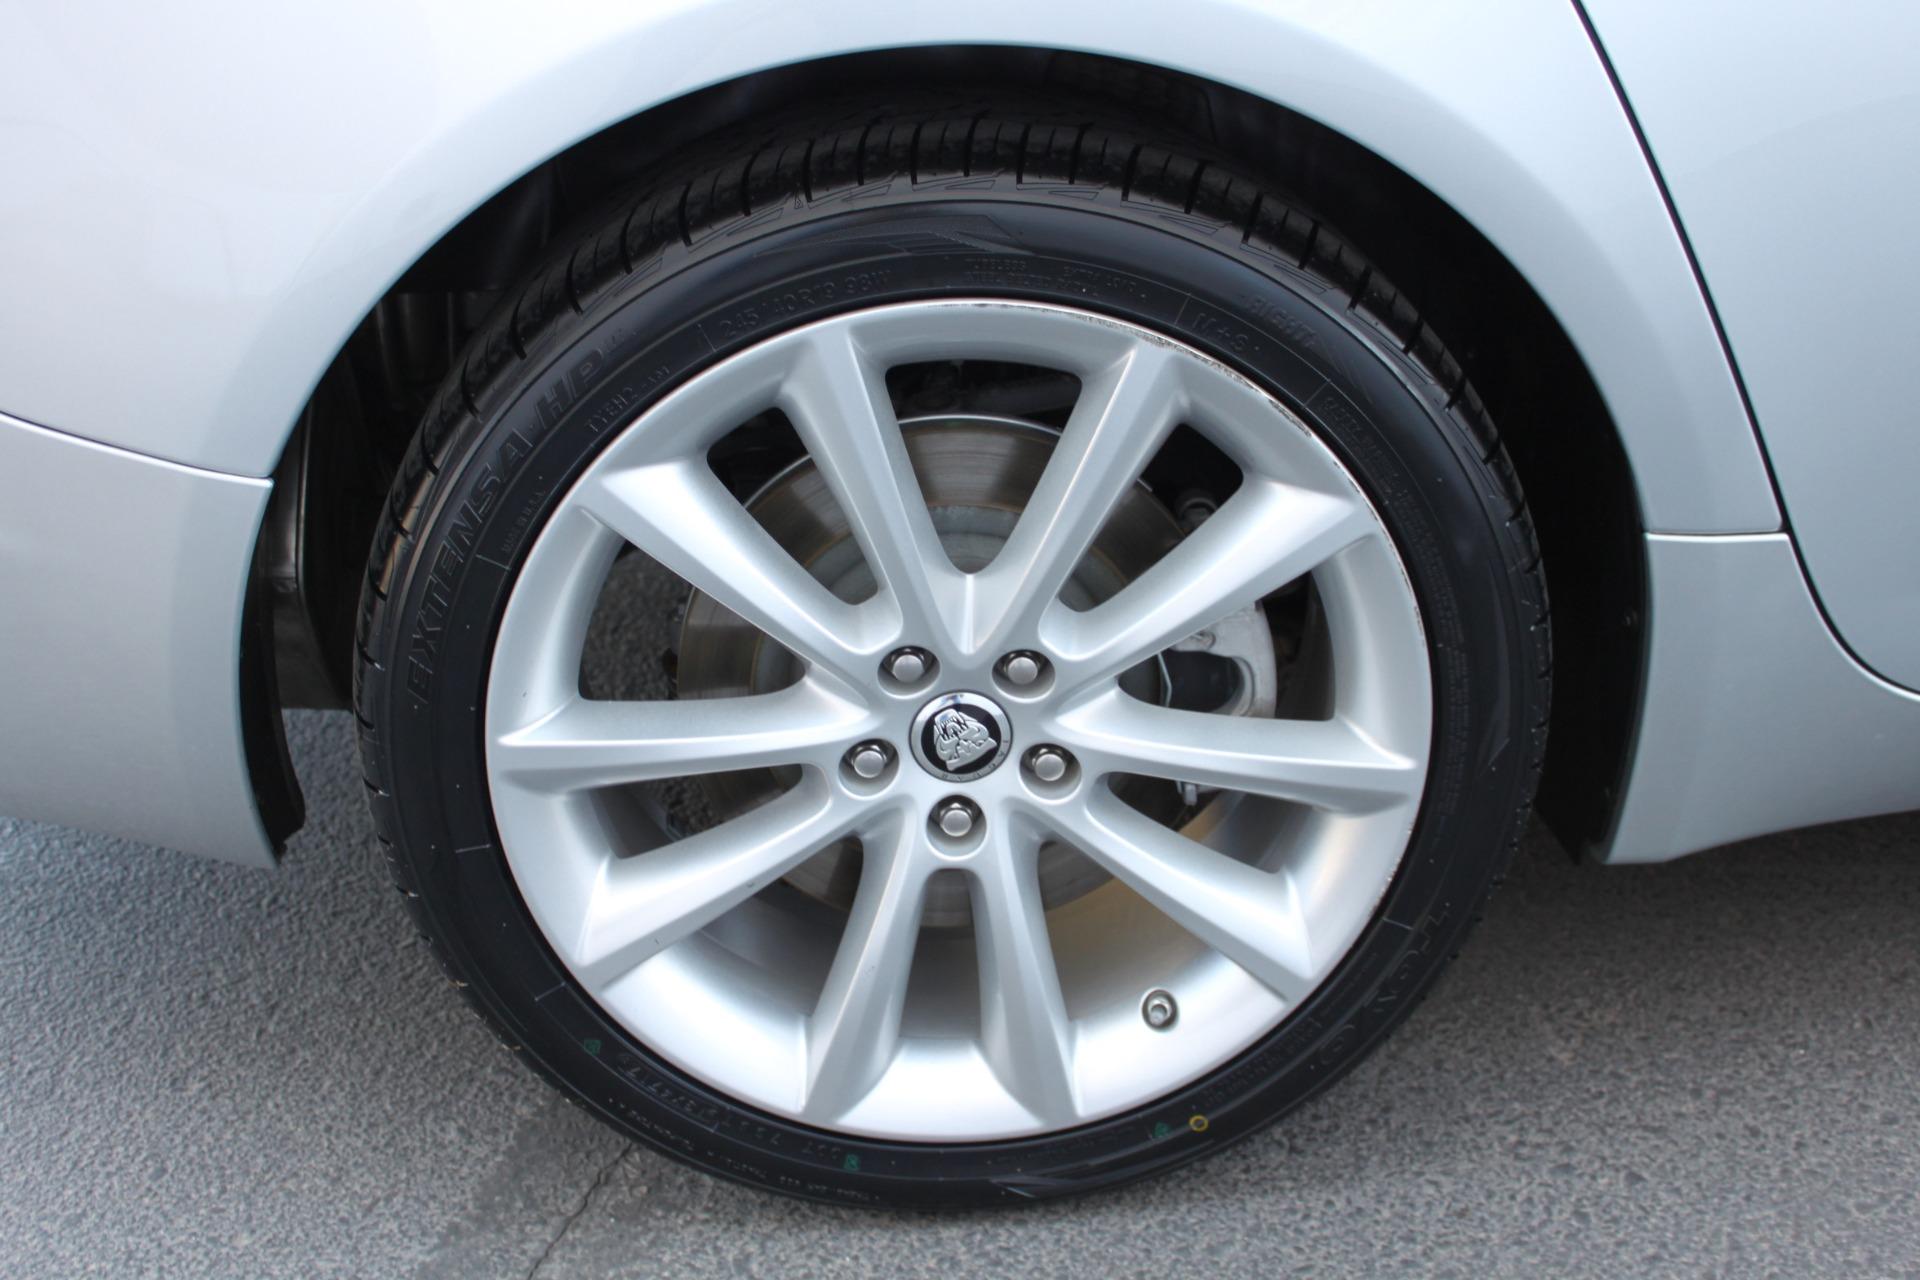 Used-2013-Jaguar-XF-I4-RWD-Alfa-Romeo